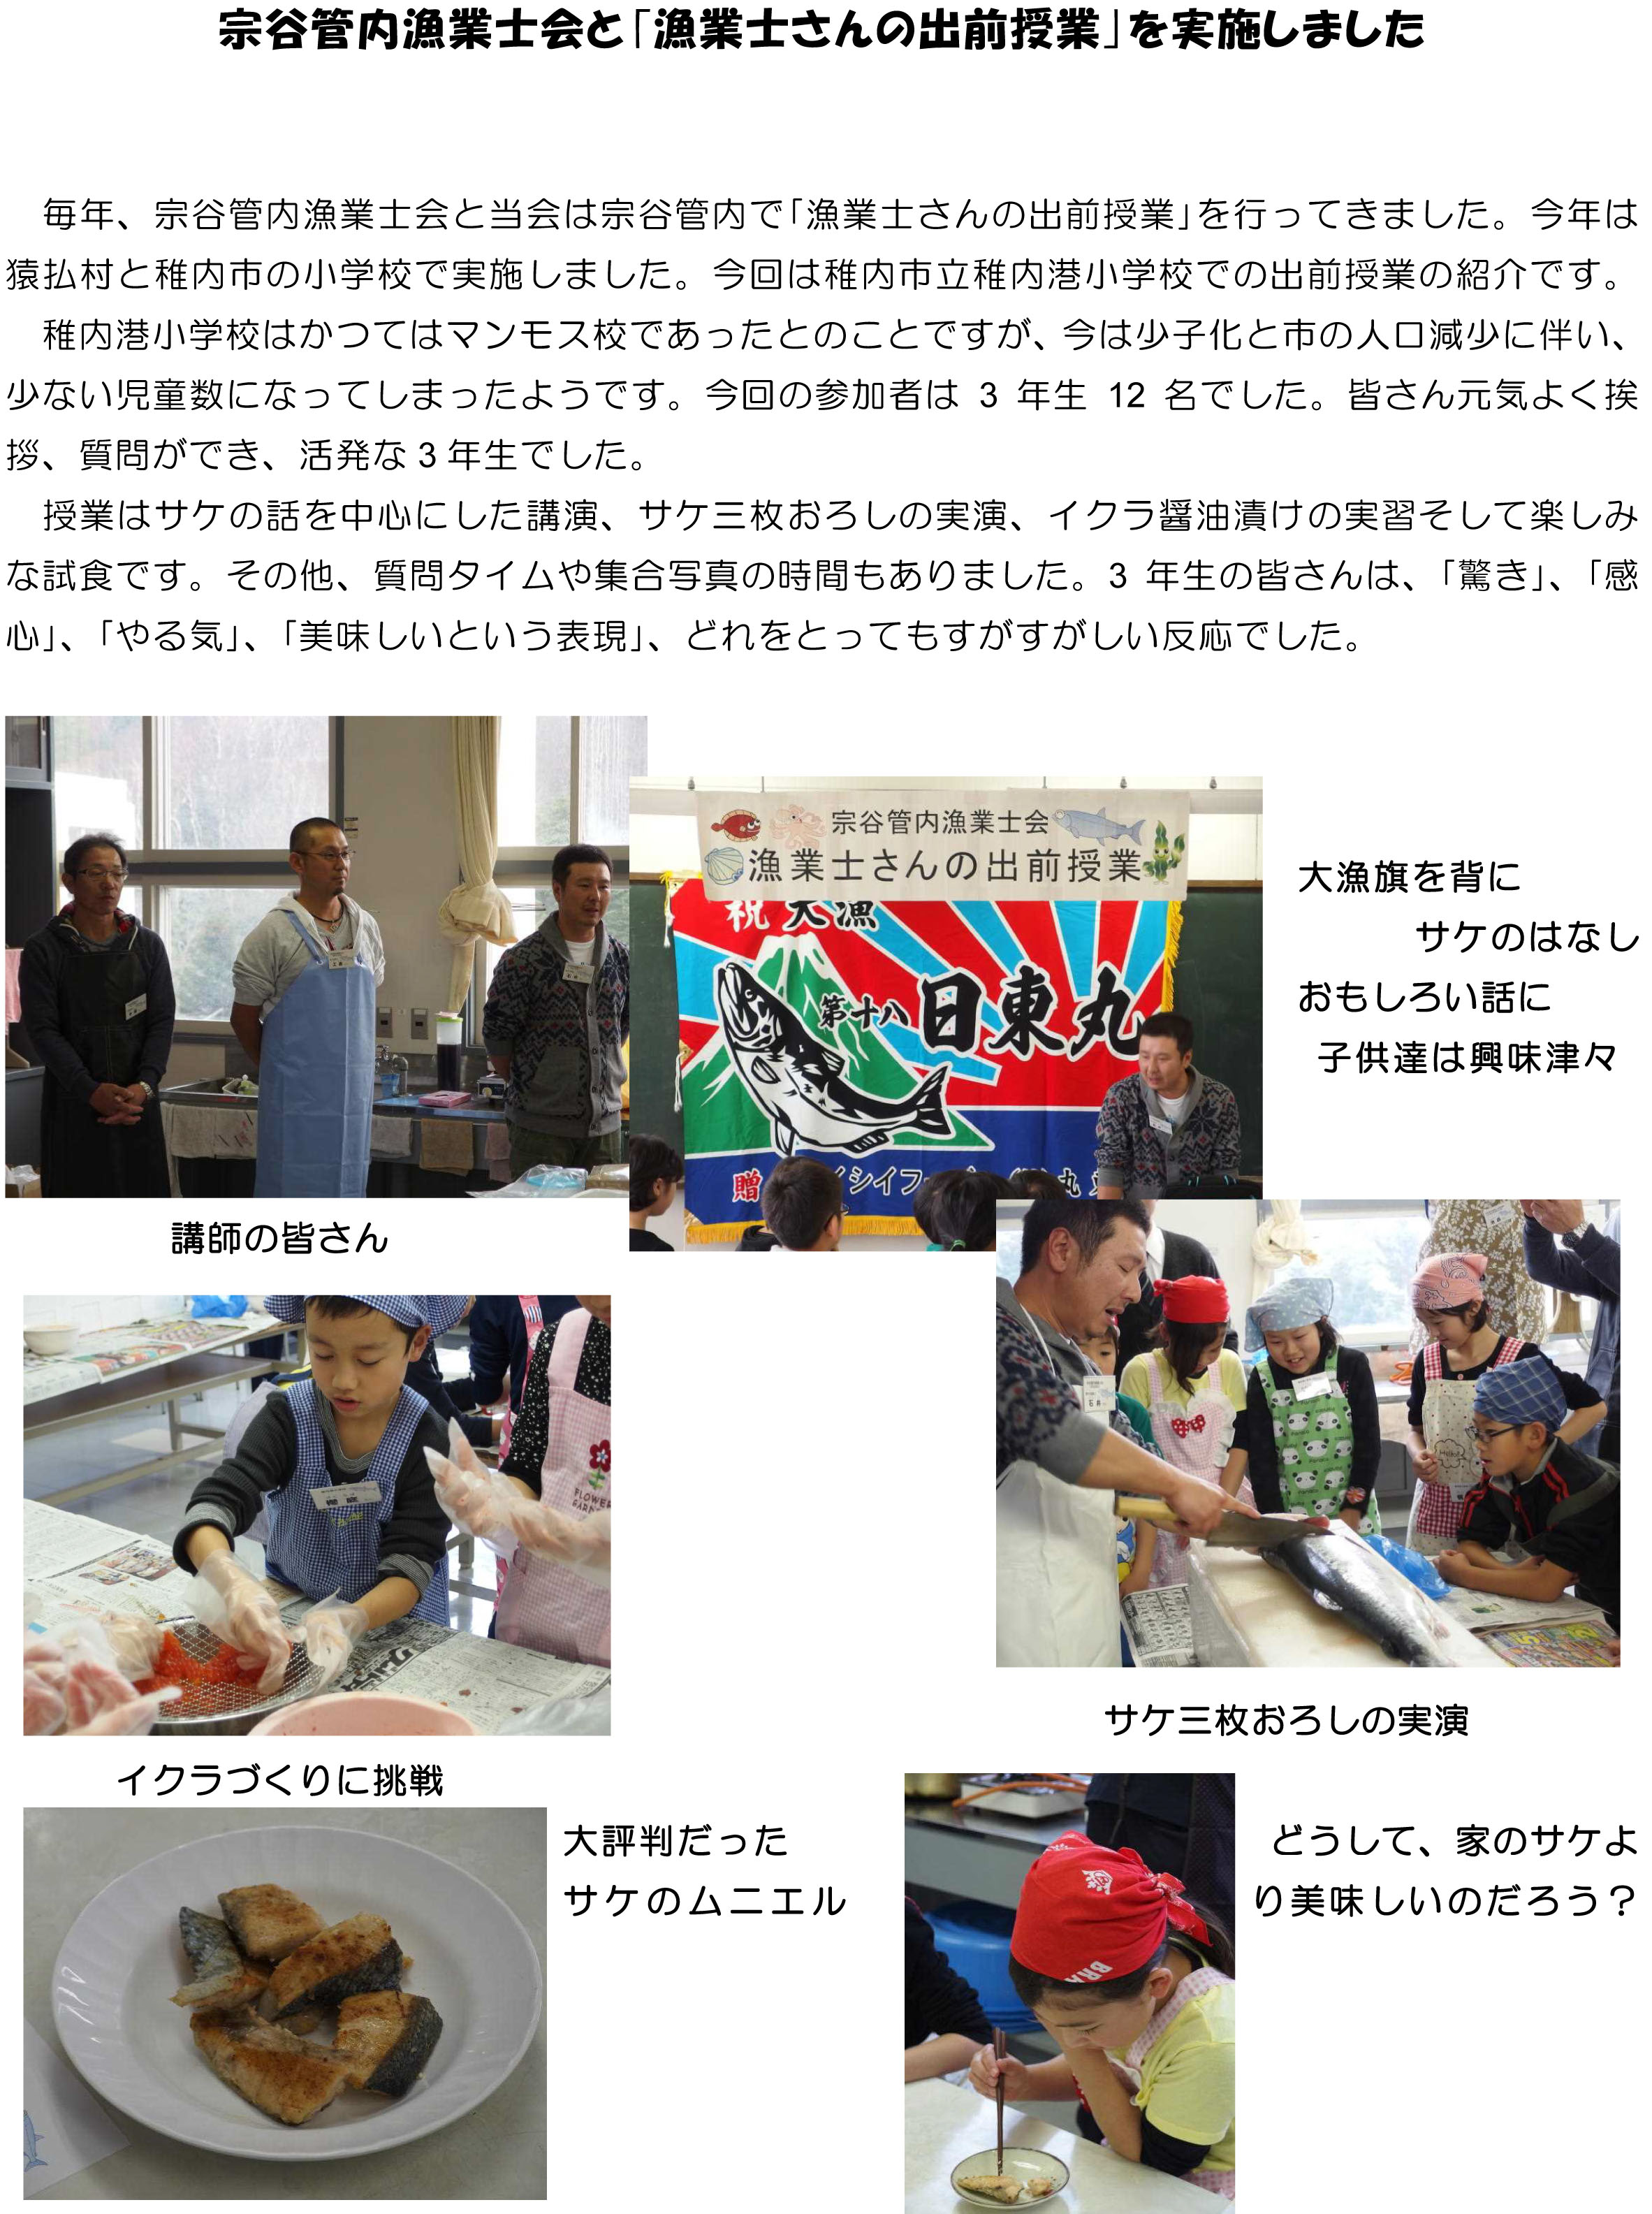 H26HP原稿(魚食稚内)